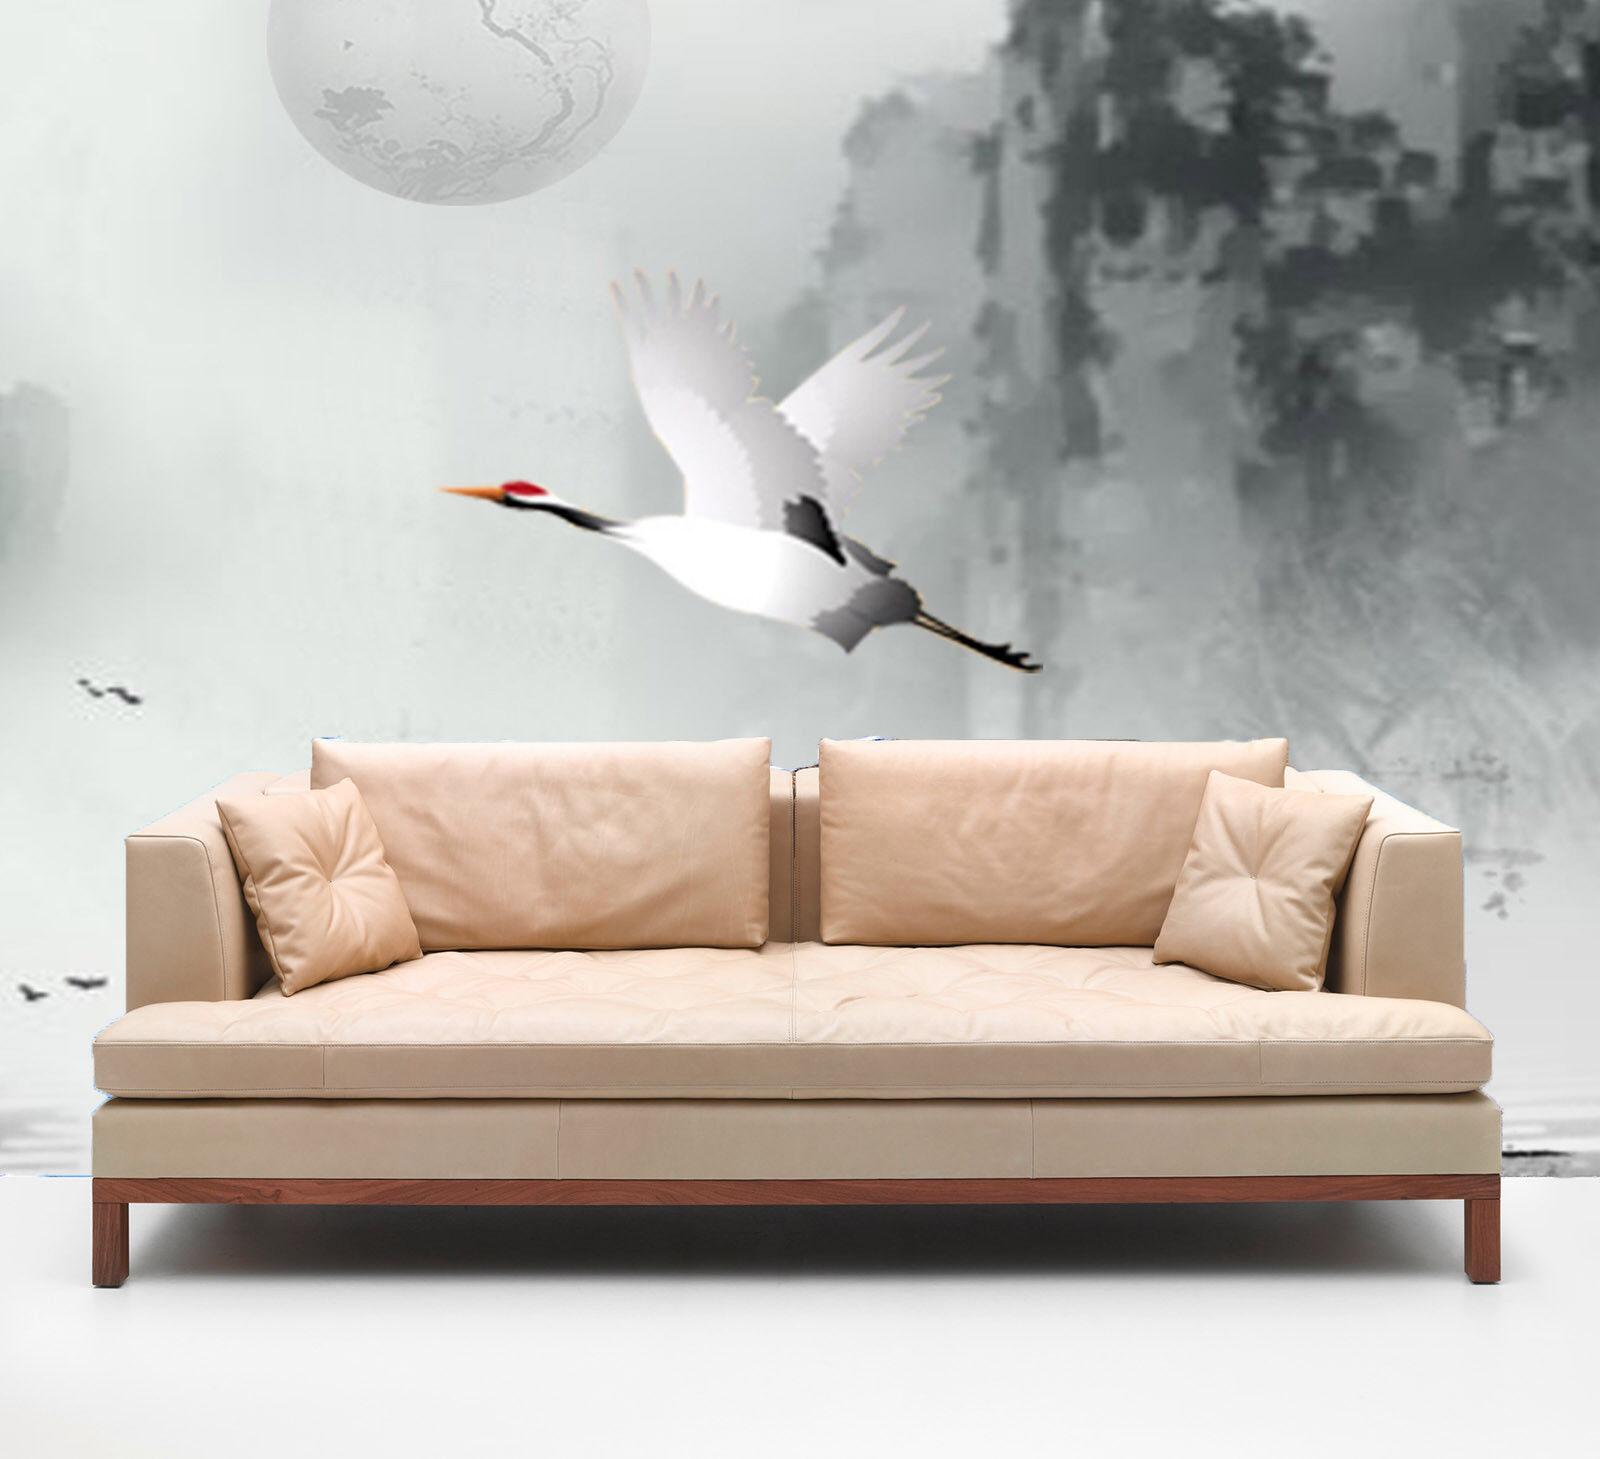 3D Fliegen Reiher Stiefel Sonne 7 Tapete Wandgemälde Tapete Tapeten Bild Familie DE